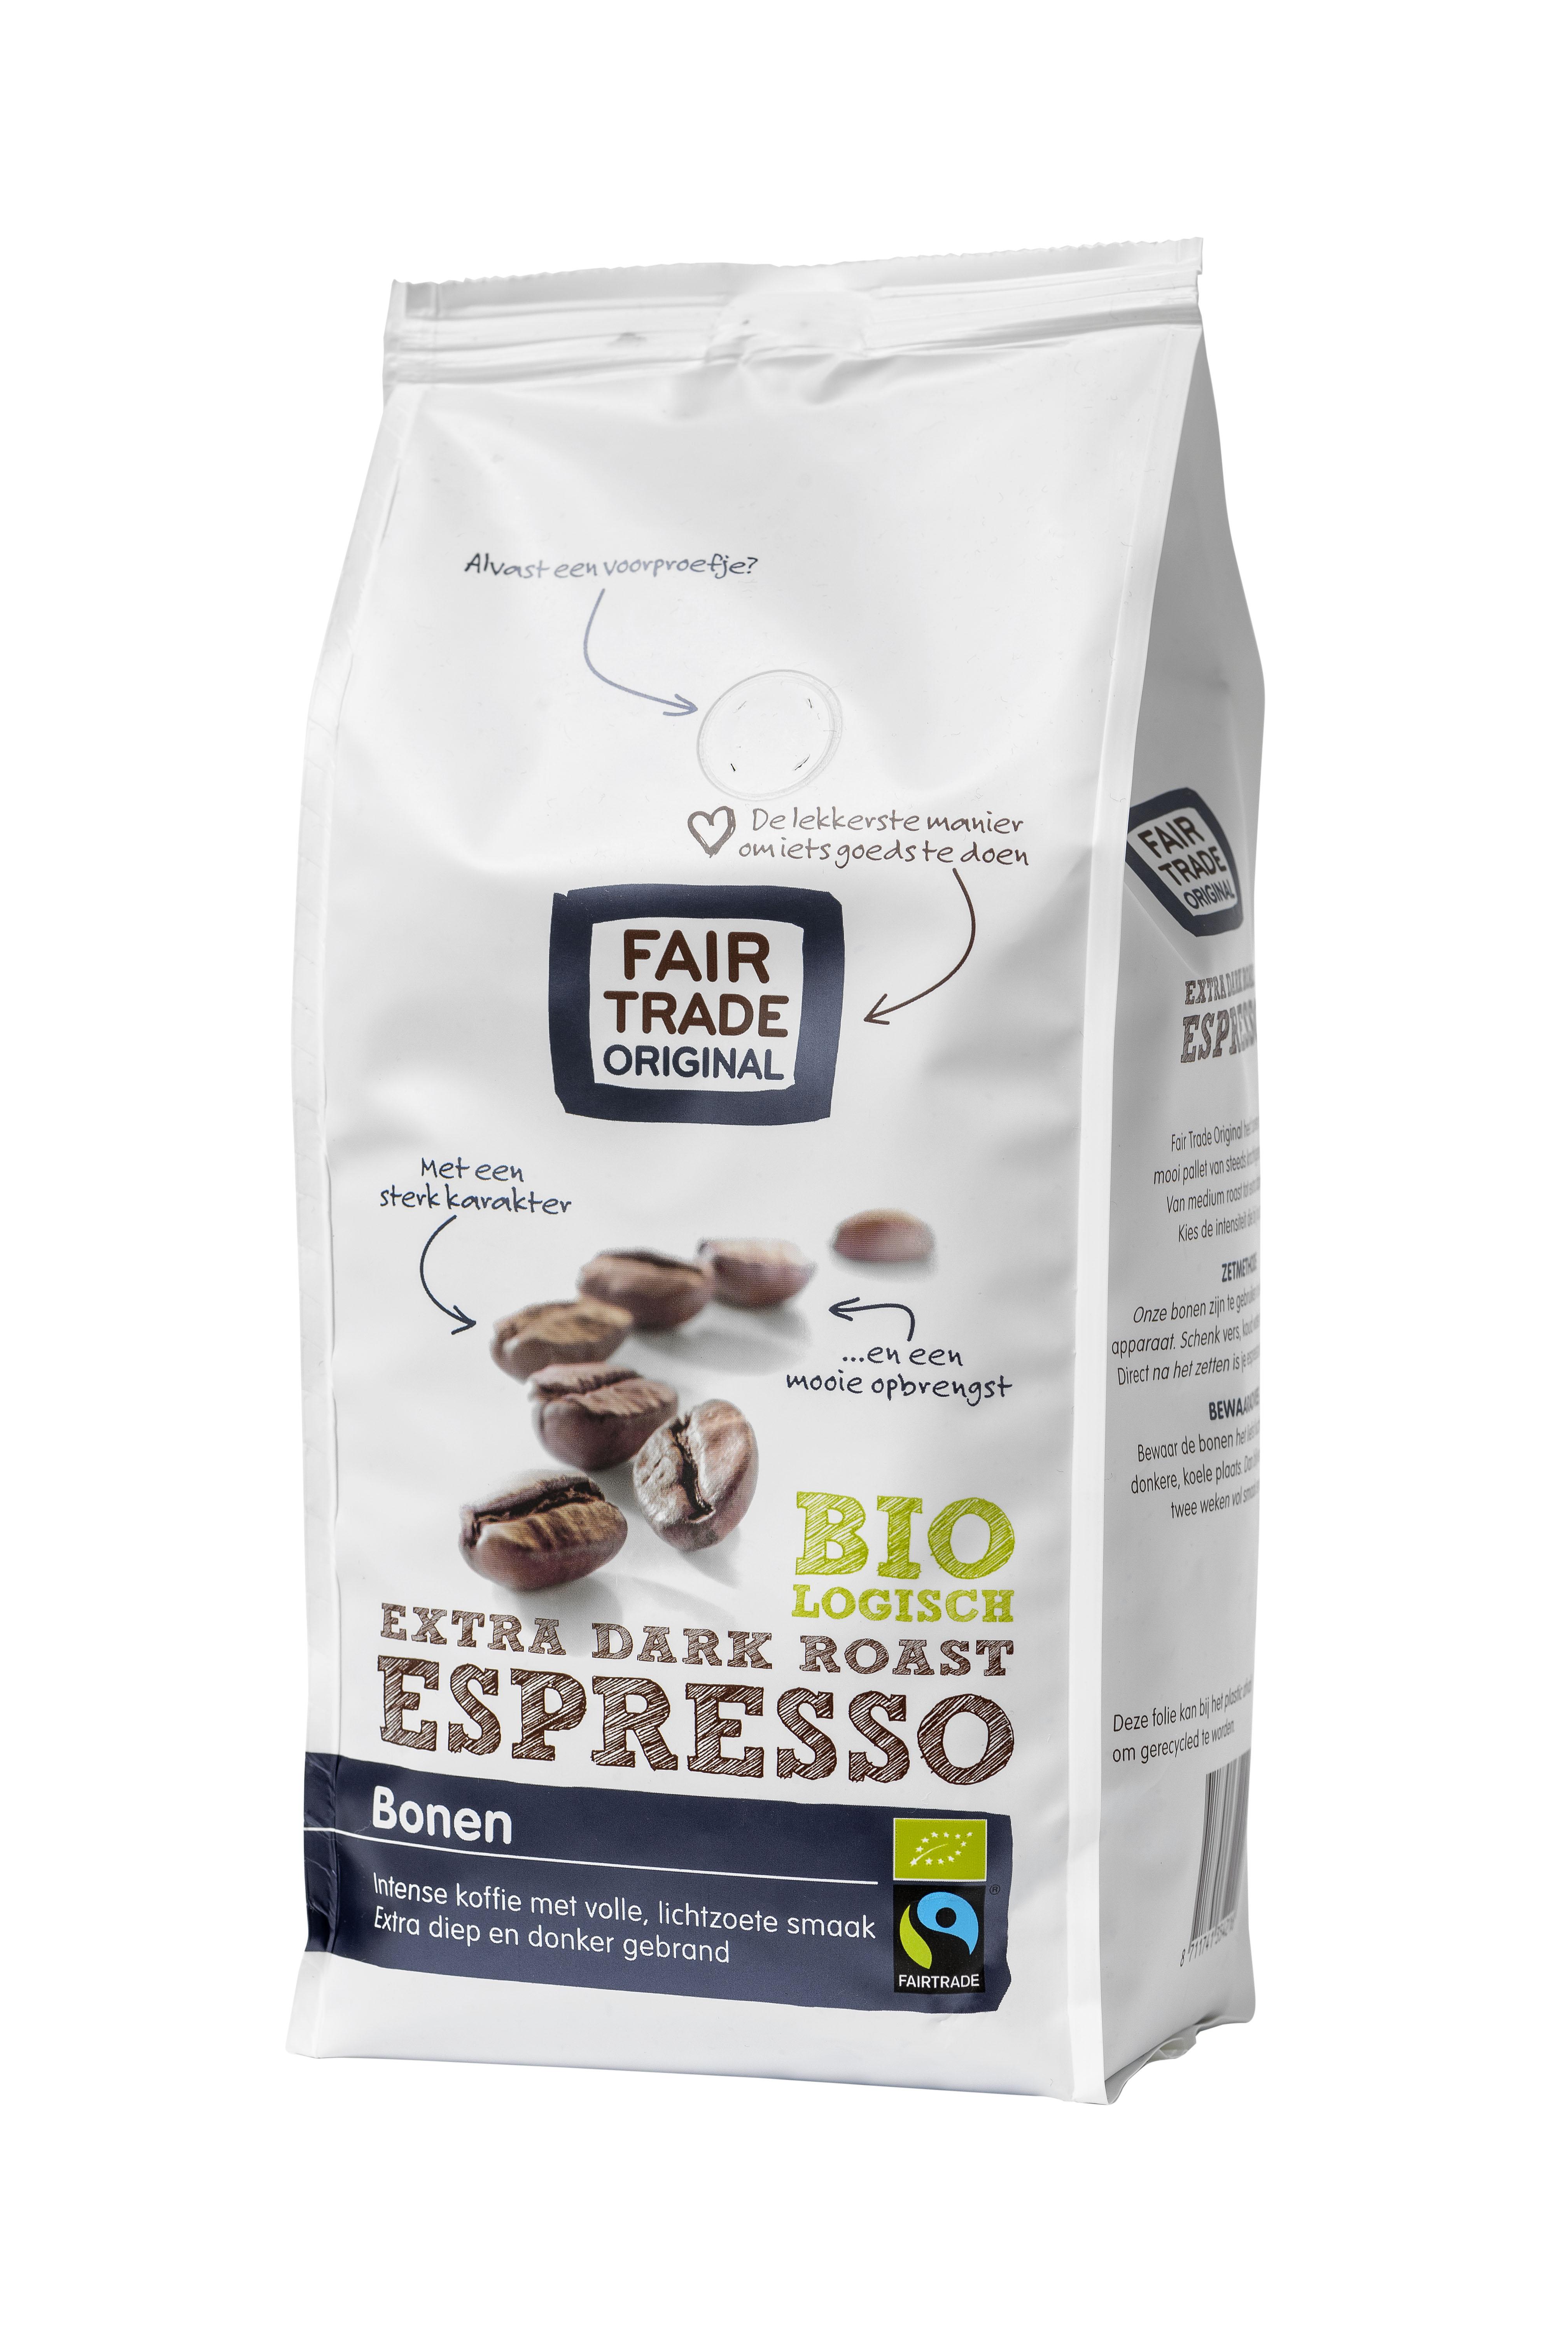 Espresso-bonen-EXTRA-DARK-ROAST-BIO-500g-Fair Trade Original-schuin